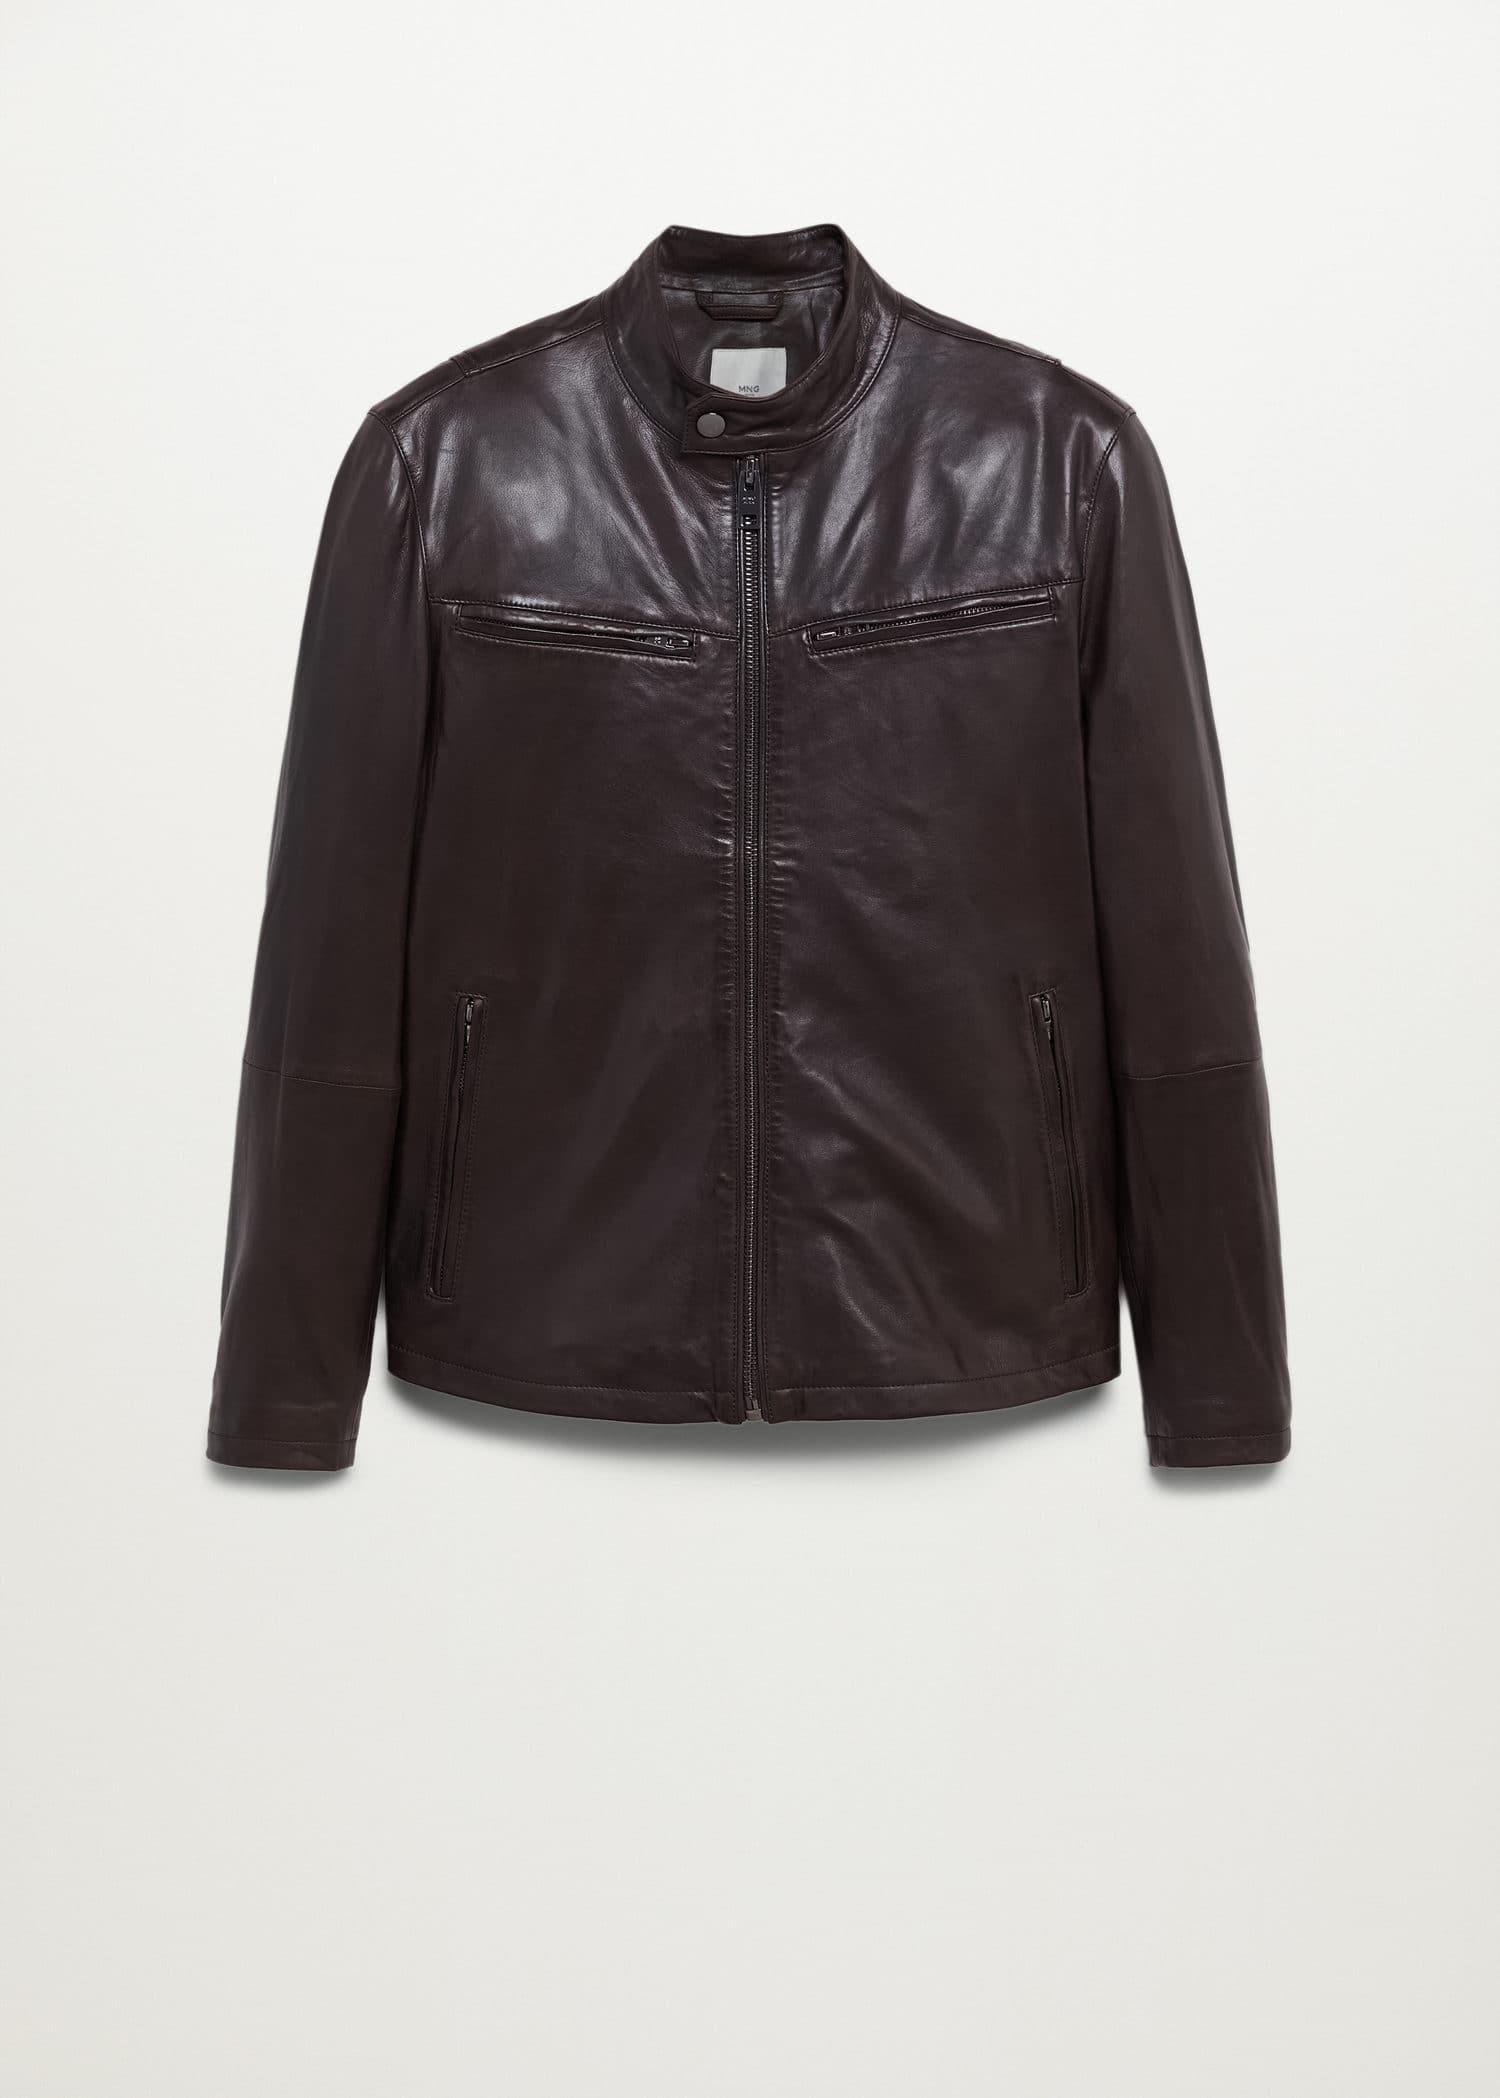 Modalite Net Mango Brown Nape Biker Jacket 77054390 32